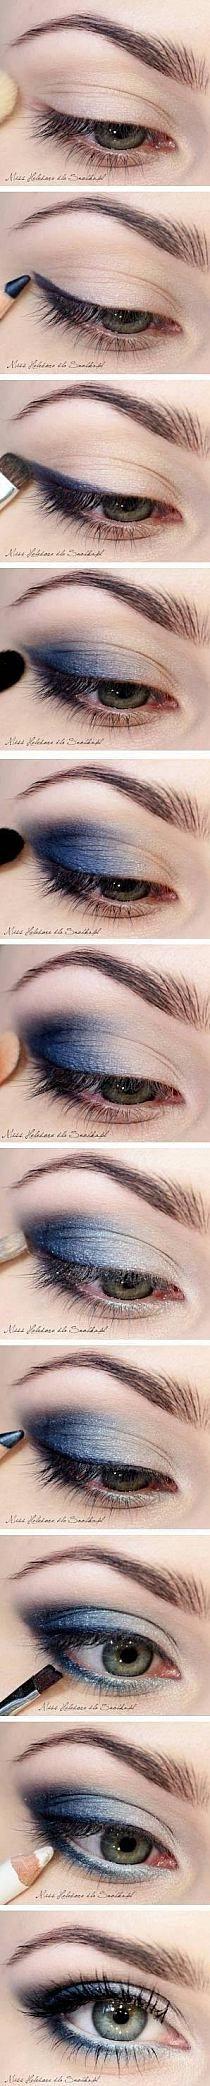 Mandelformade ögon – tutorial   Imakeyousmile.se